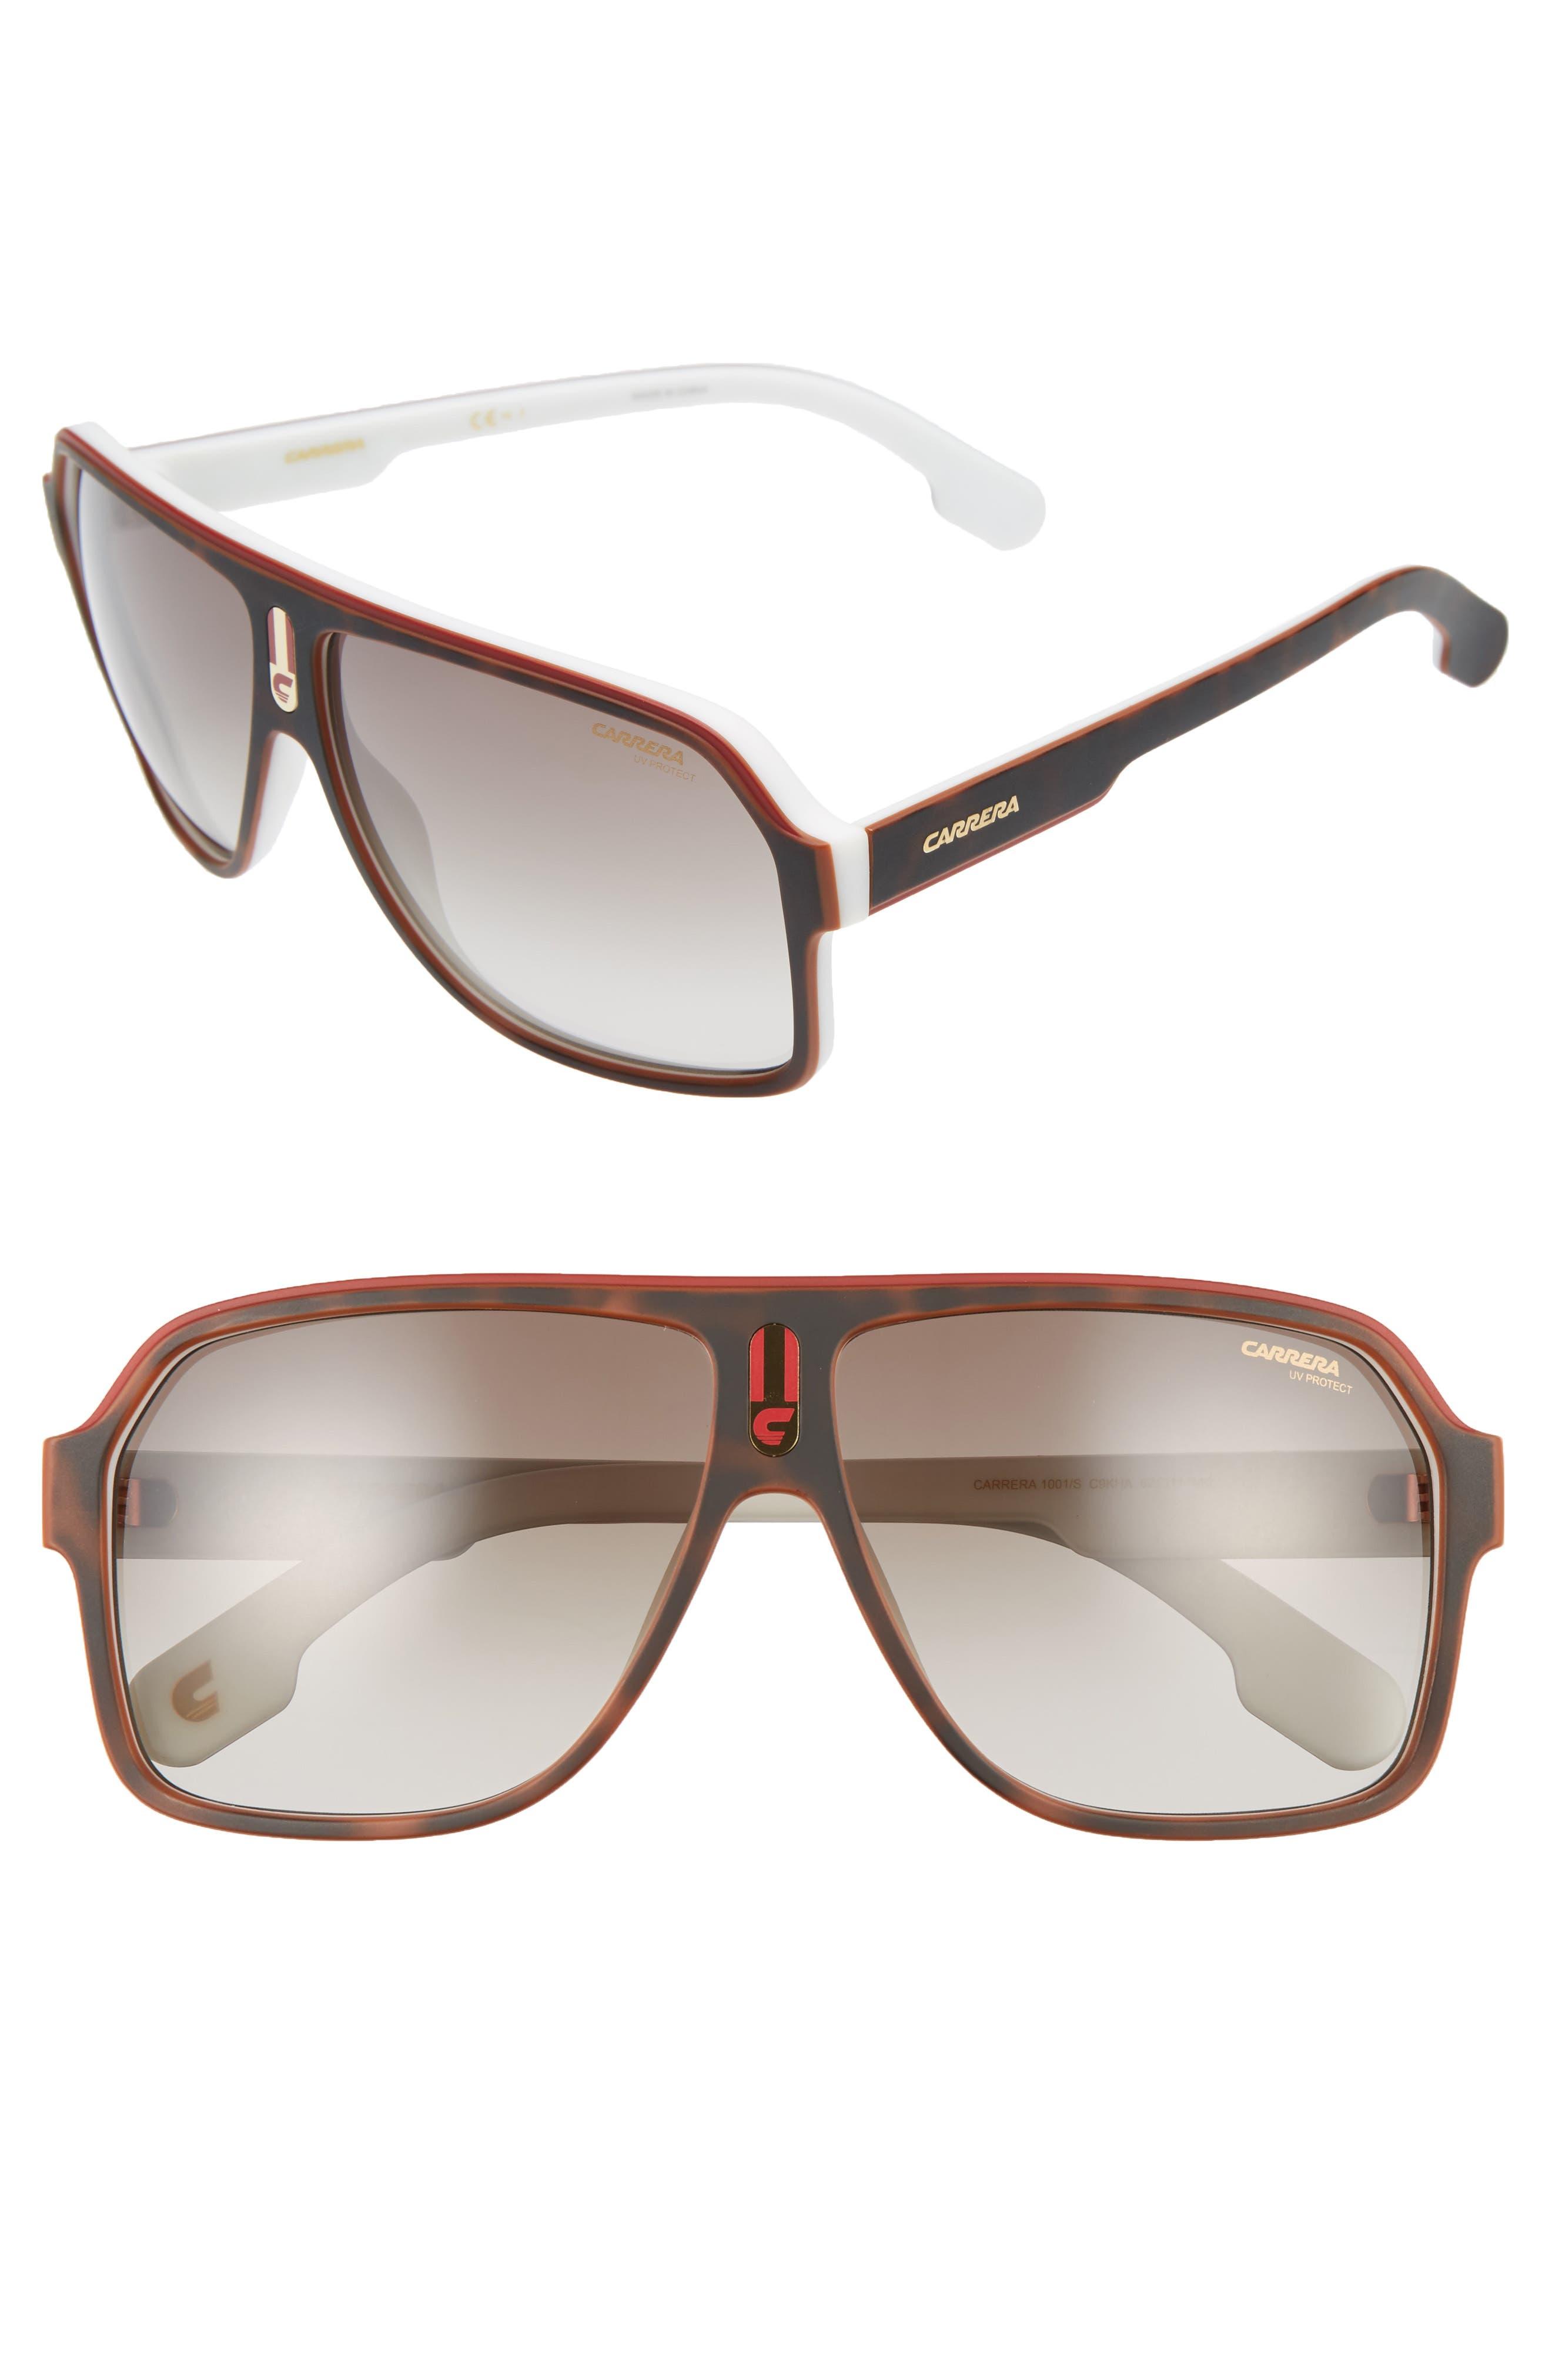 1001/S 62mm Sunglasses,                         Main,                         color, Havana White/ Brown